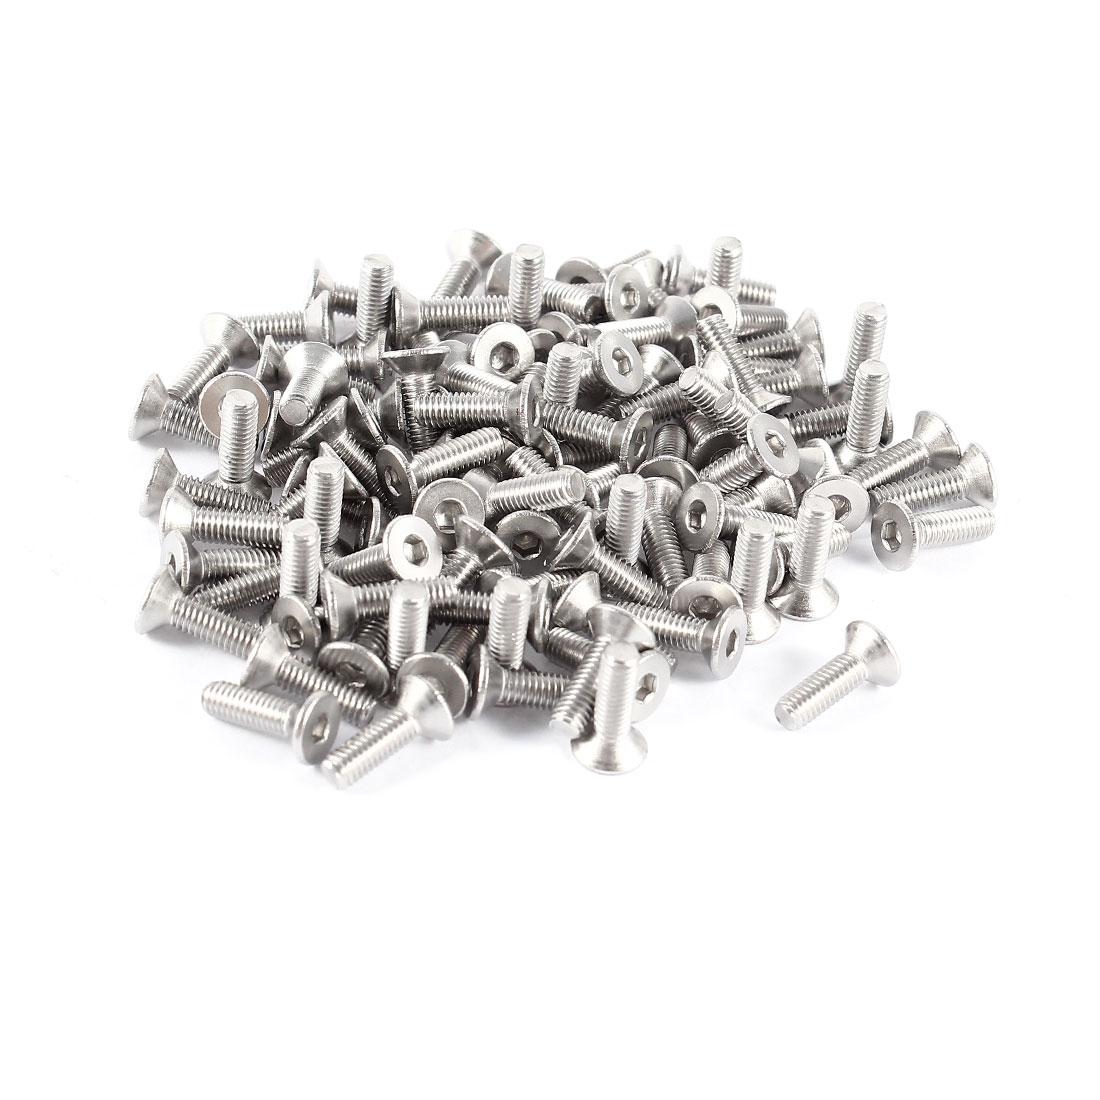 100 x 304HC Stainless Steel Countersunk Flat Head Hex Socket Bolt Screws M3x10mm